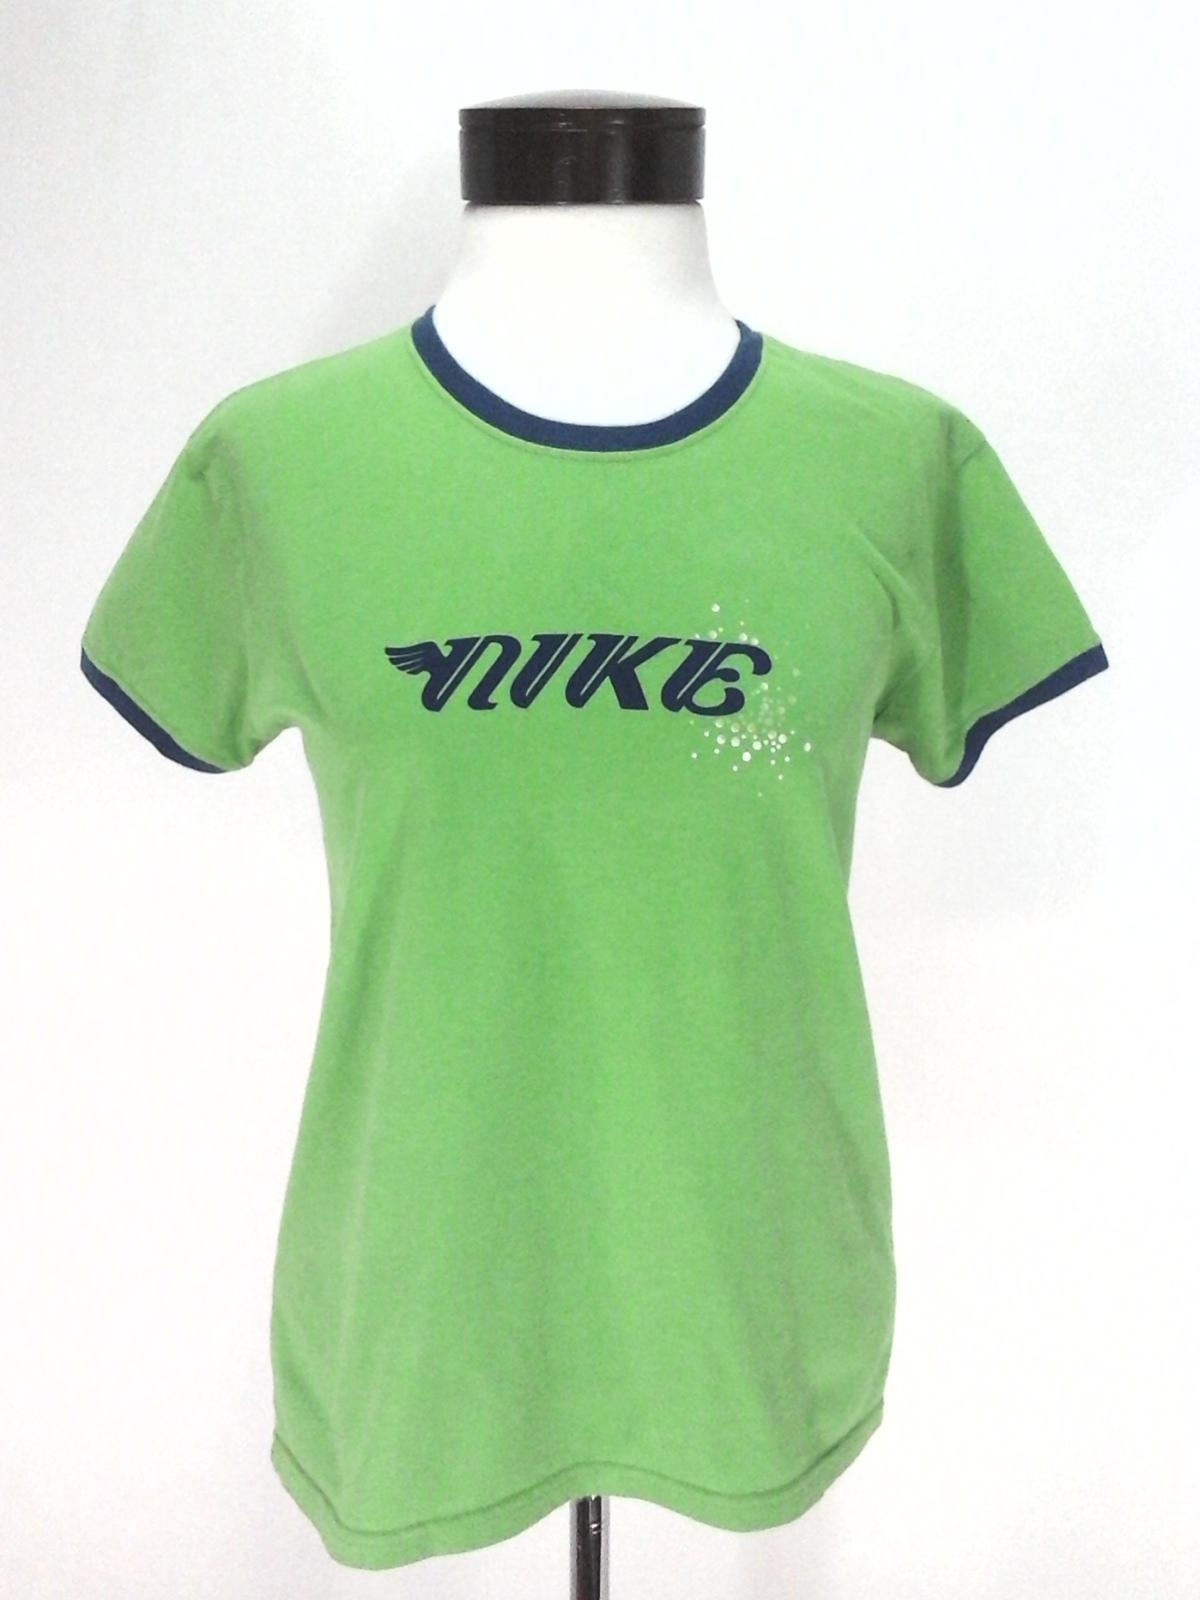 6fe28011 NIKE T-Shirt Vintage 90's Ringer Cotton Athletic Top Green/Blue Logo  Women's M